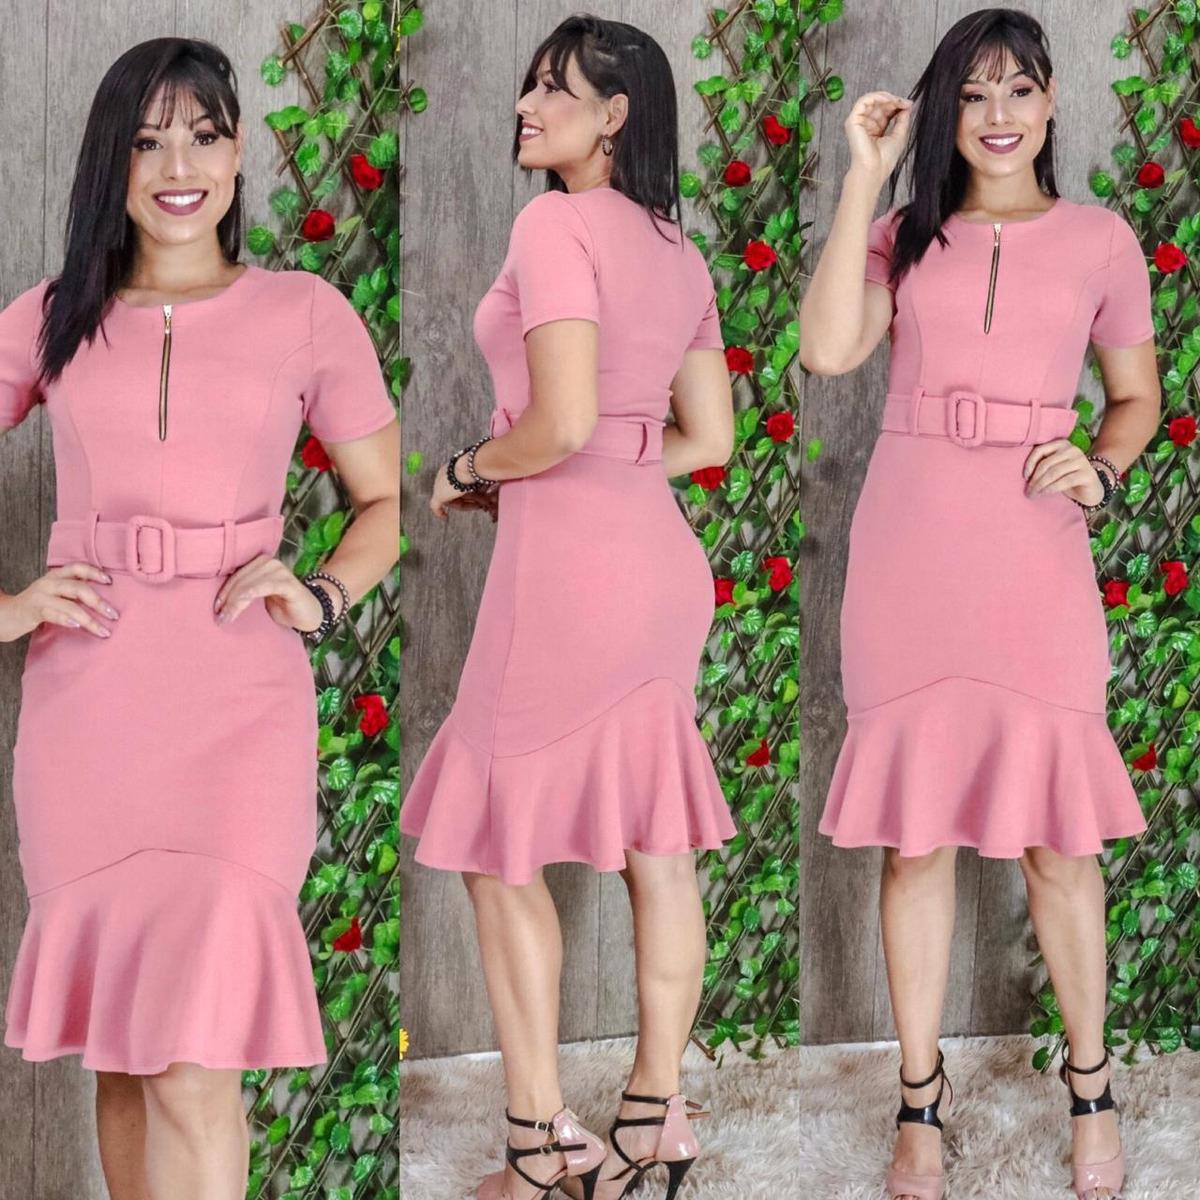 64b413db6 vestidos feminino moda evangélica congresso cinto incluso. Carregando zoom.